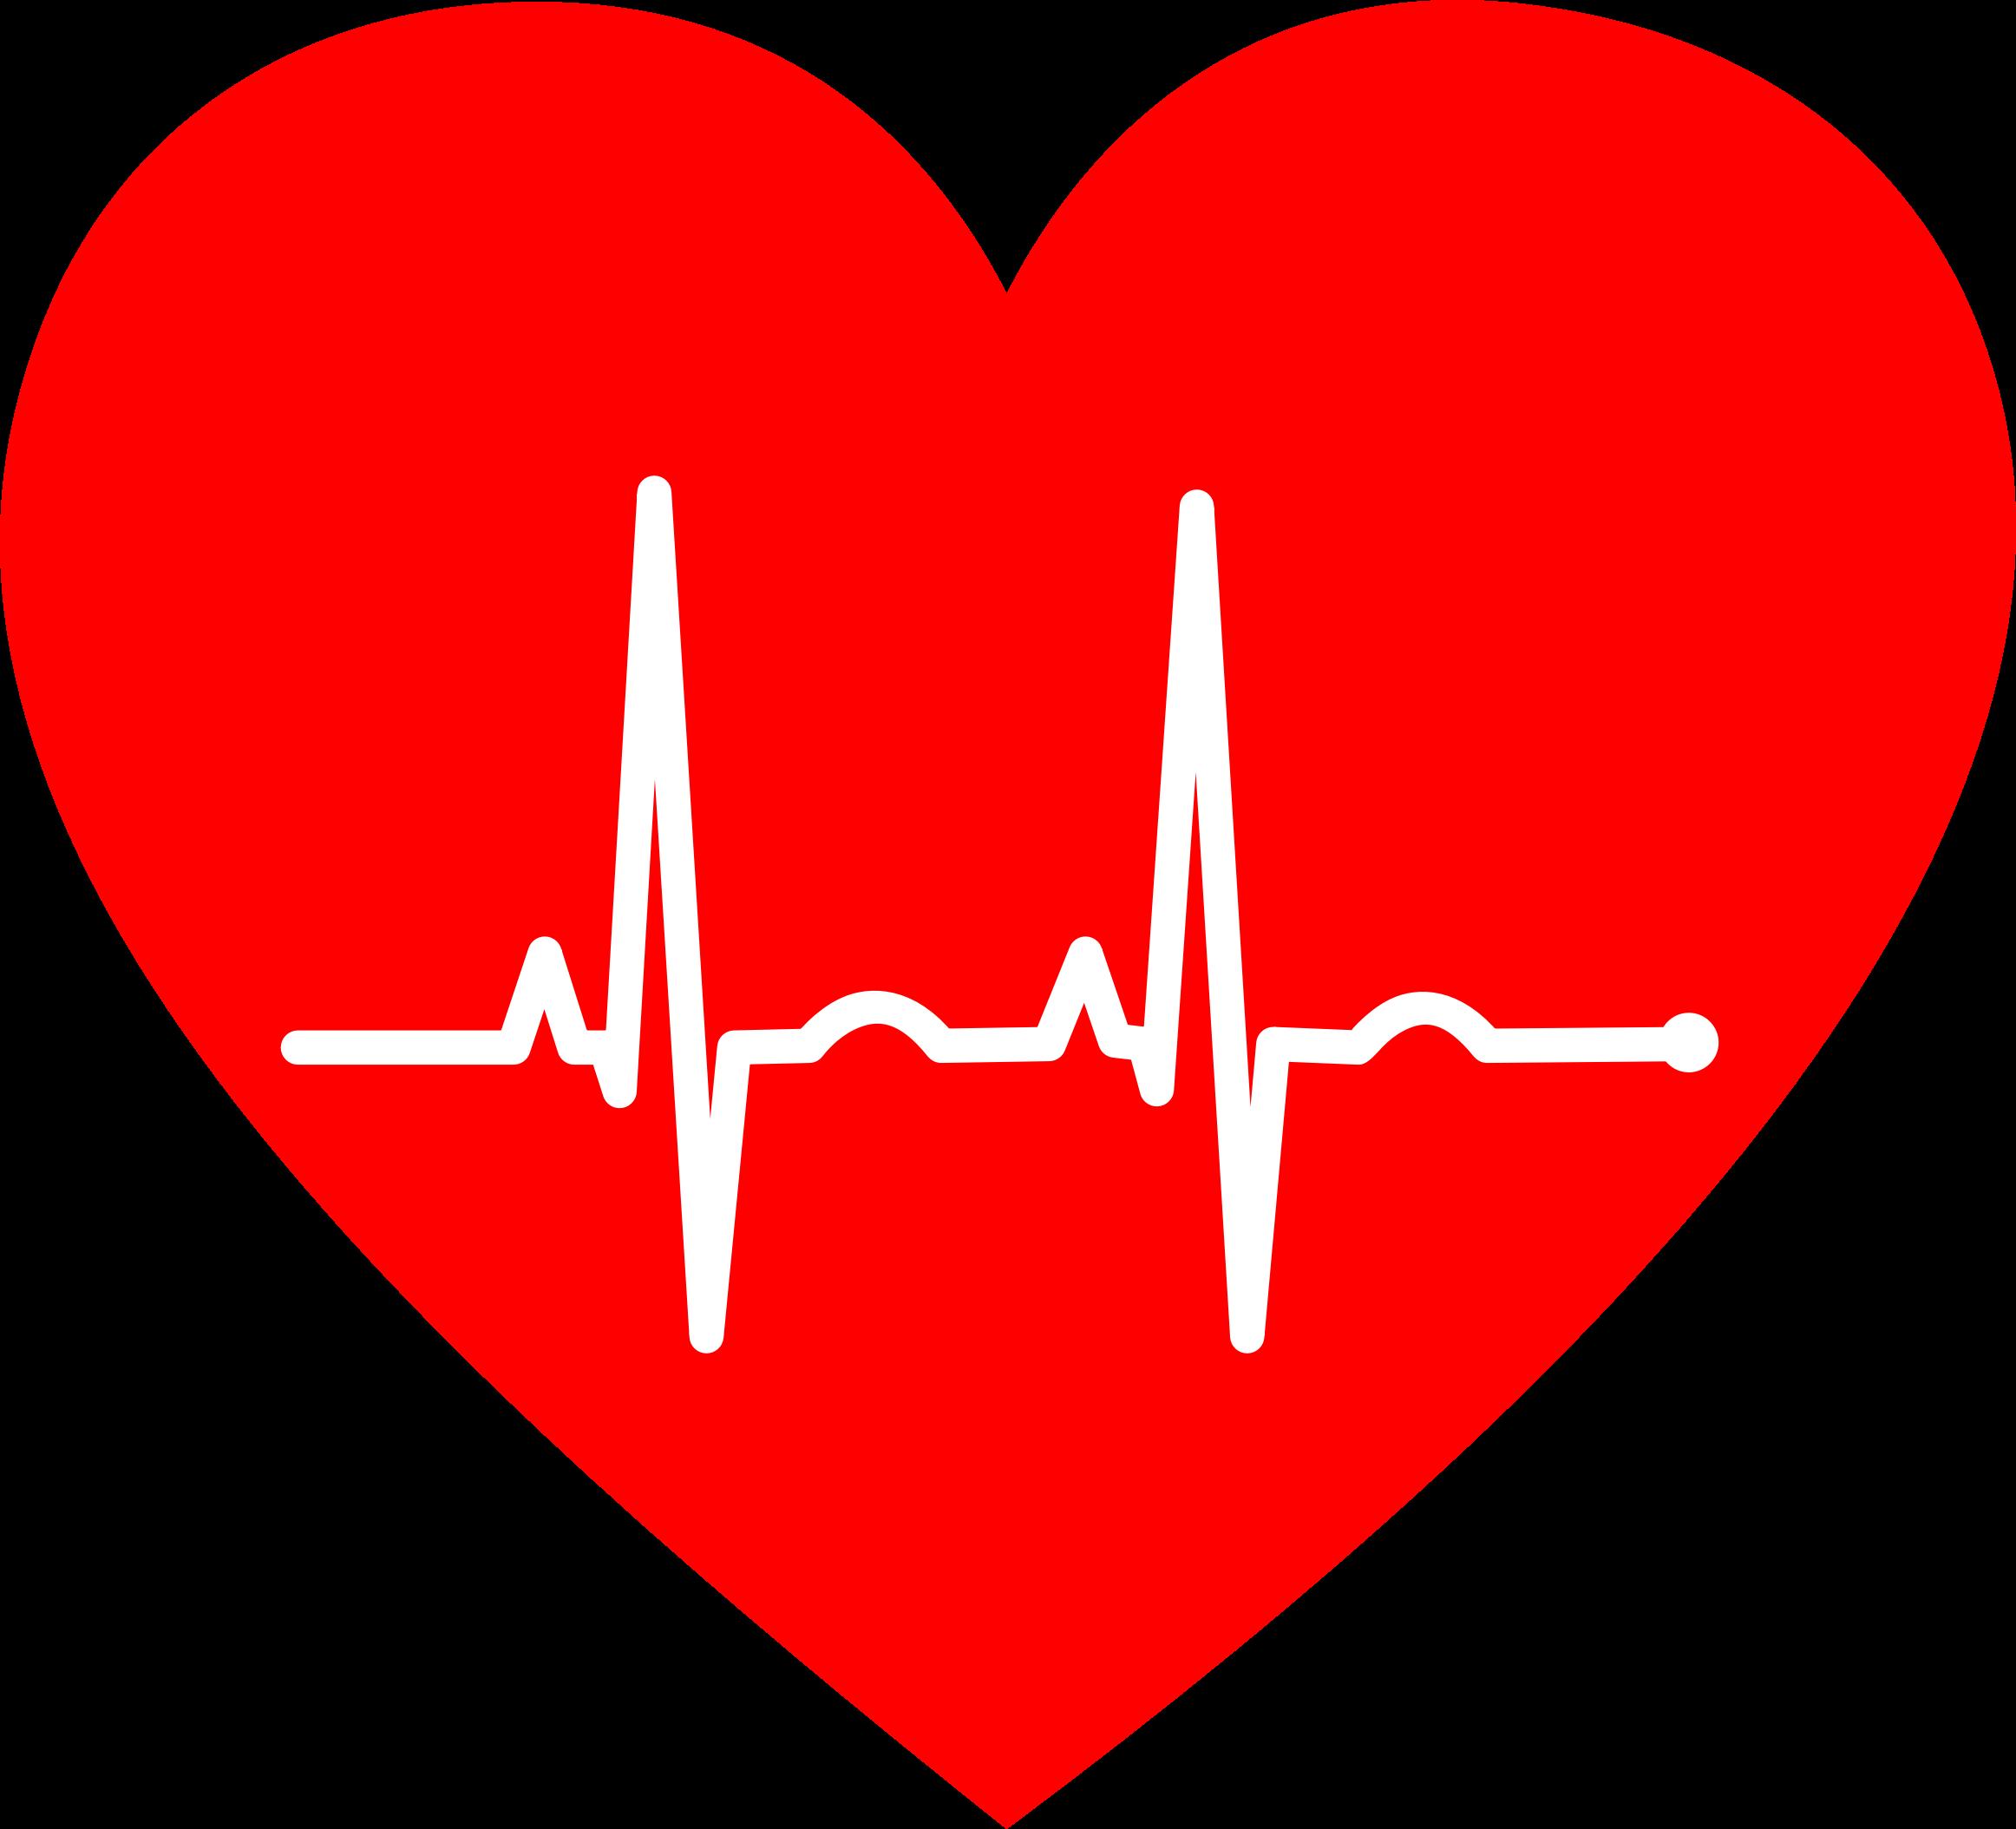 Heart clipart pulse. Ekg big image png